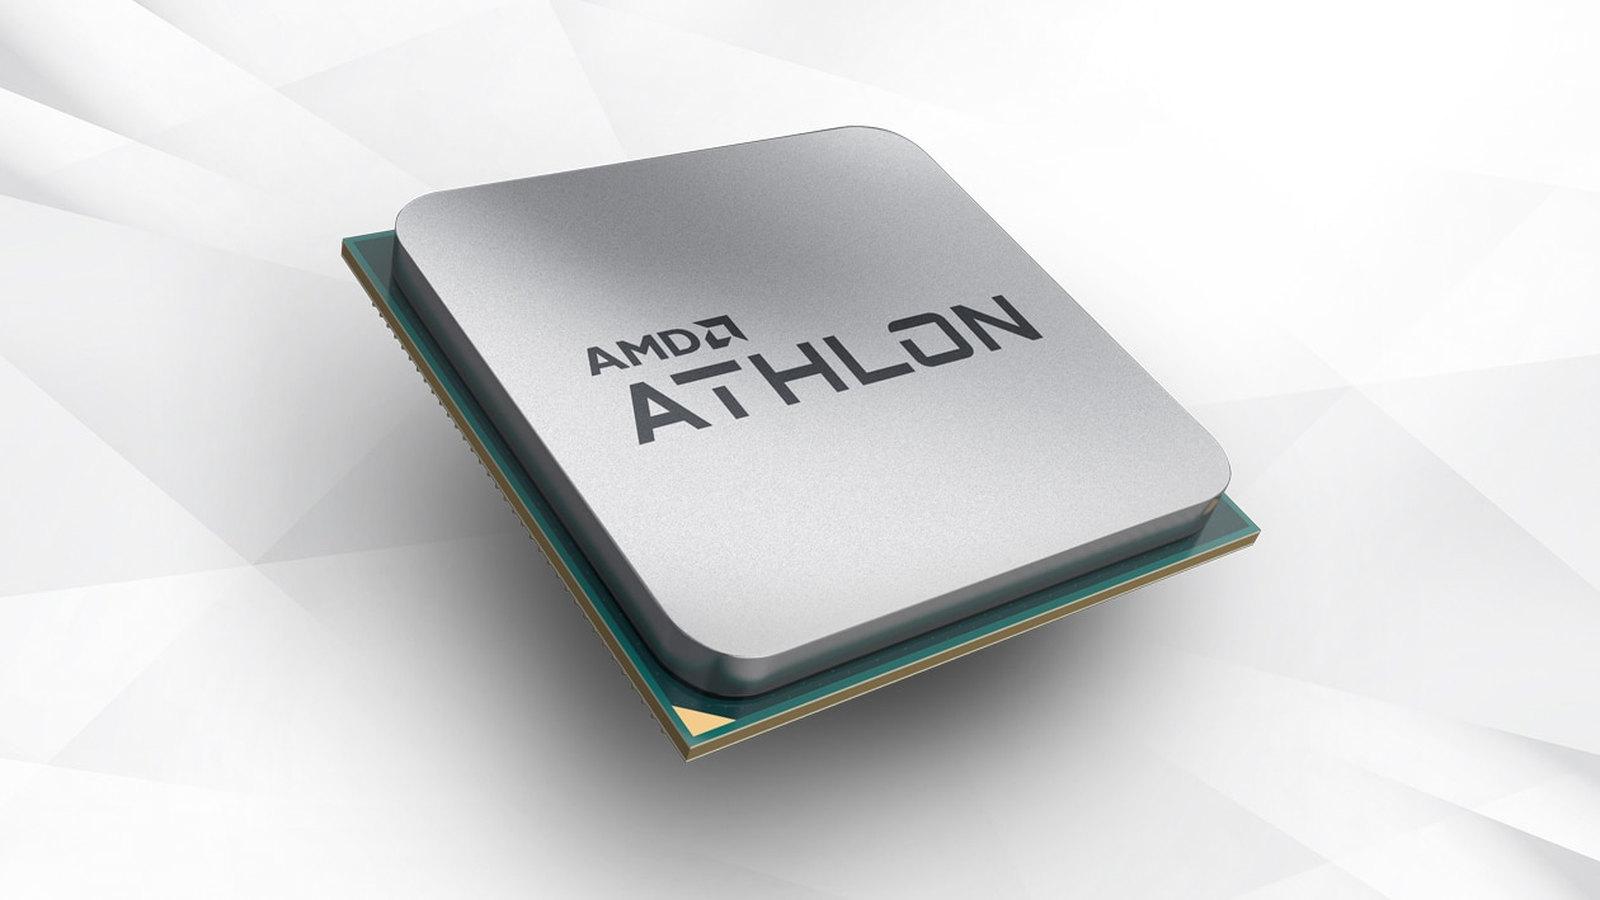 AMD Athlon processor on a white background